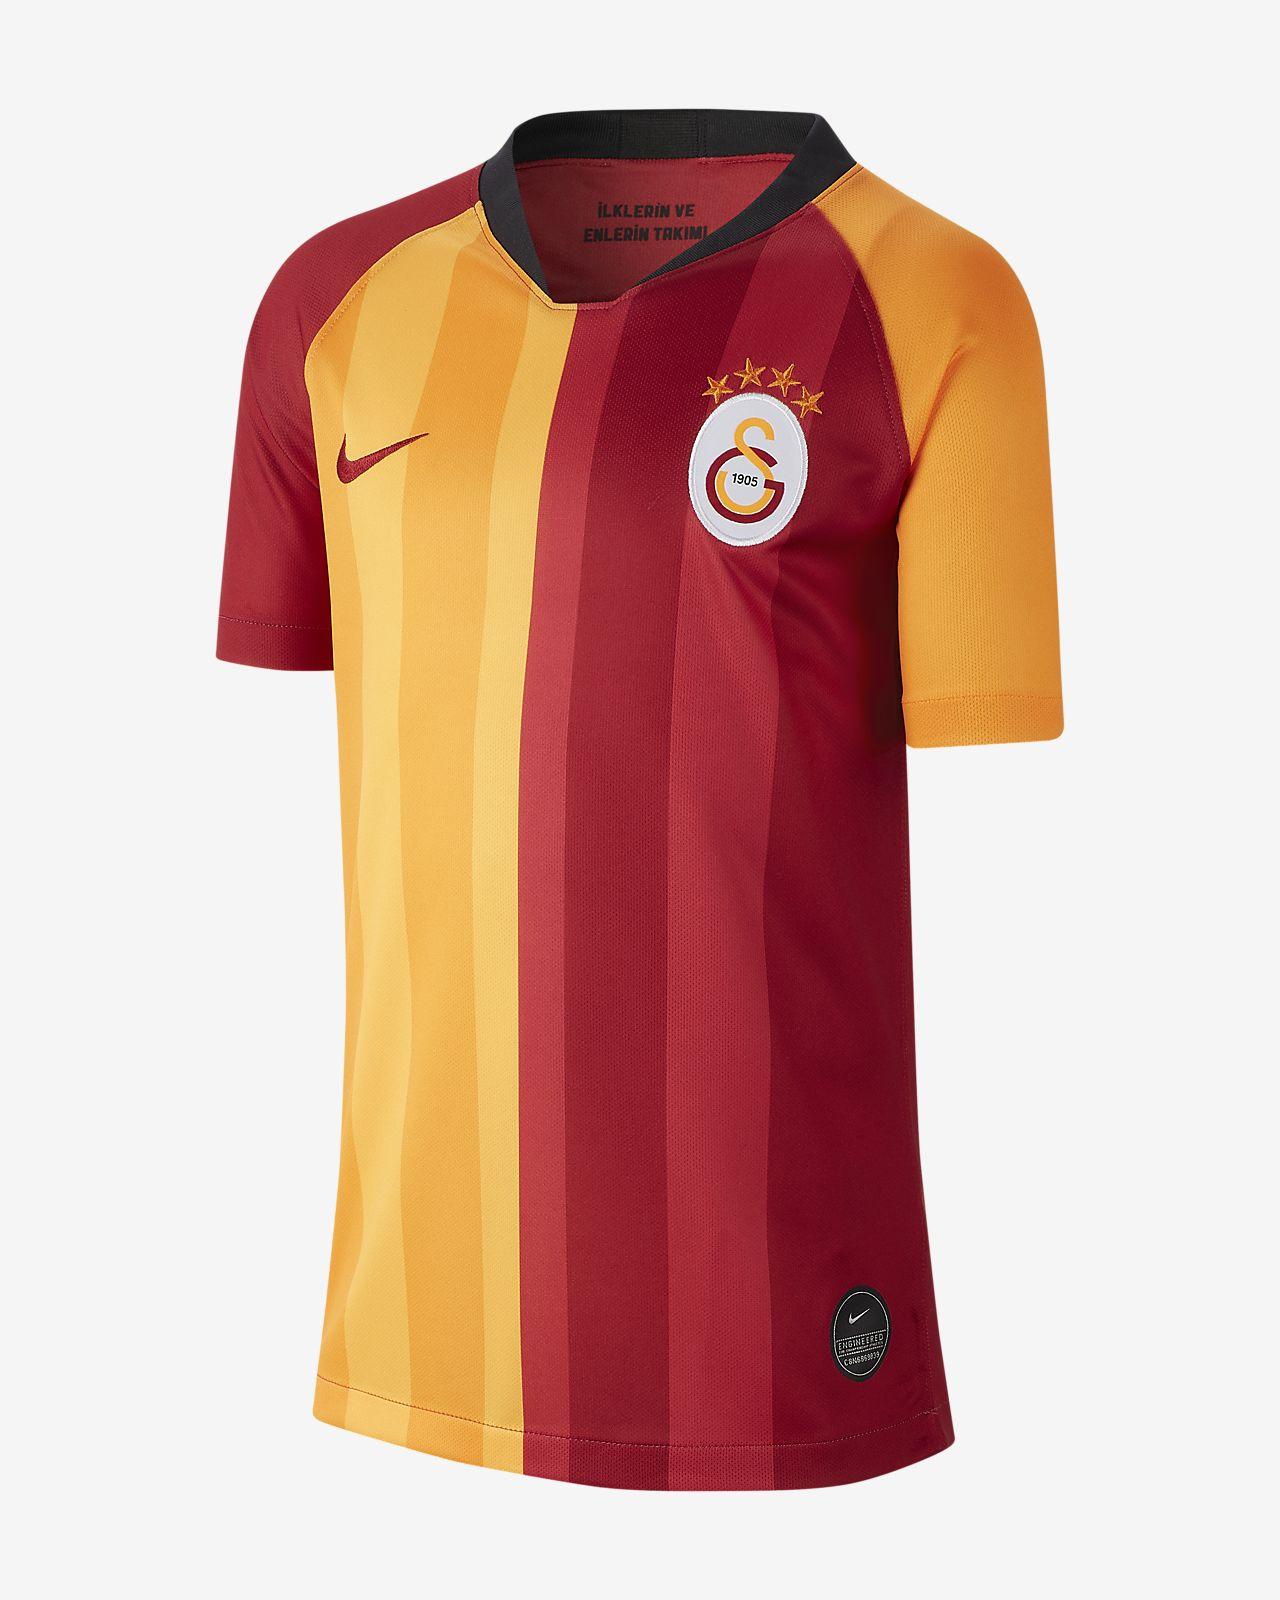 57dcd61d570 Galatasaray 2019/20 Stadium Home Camiseta de fútbol - Niño/a. Nike ...